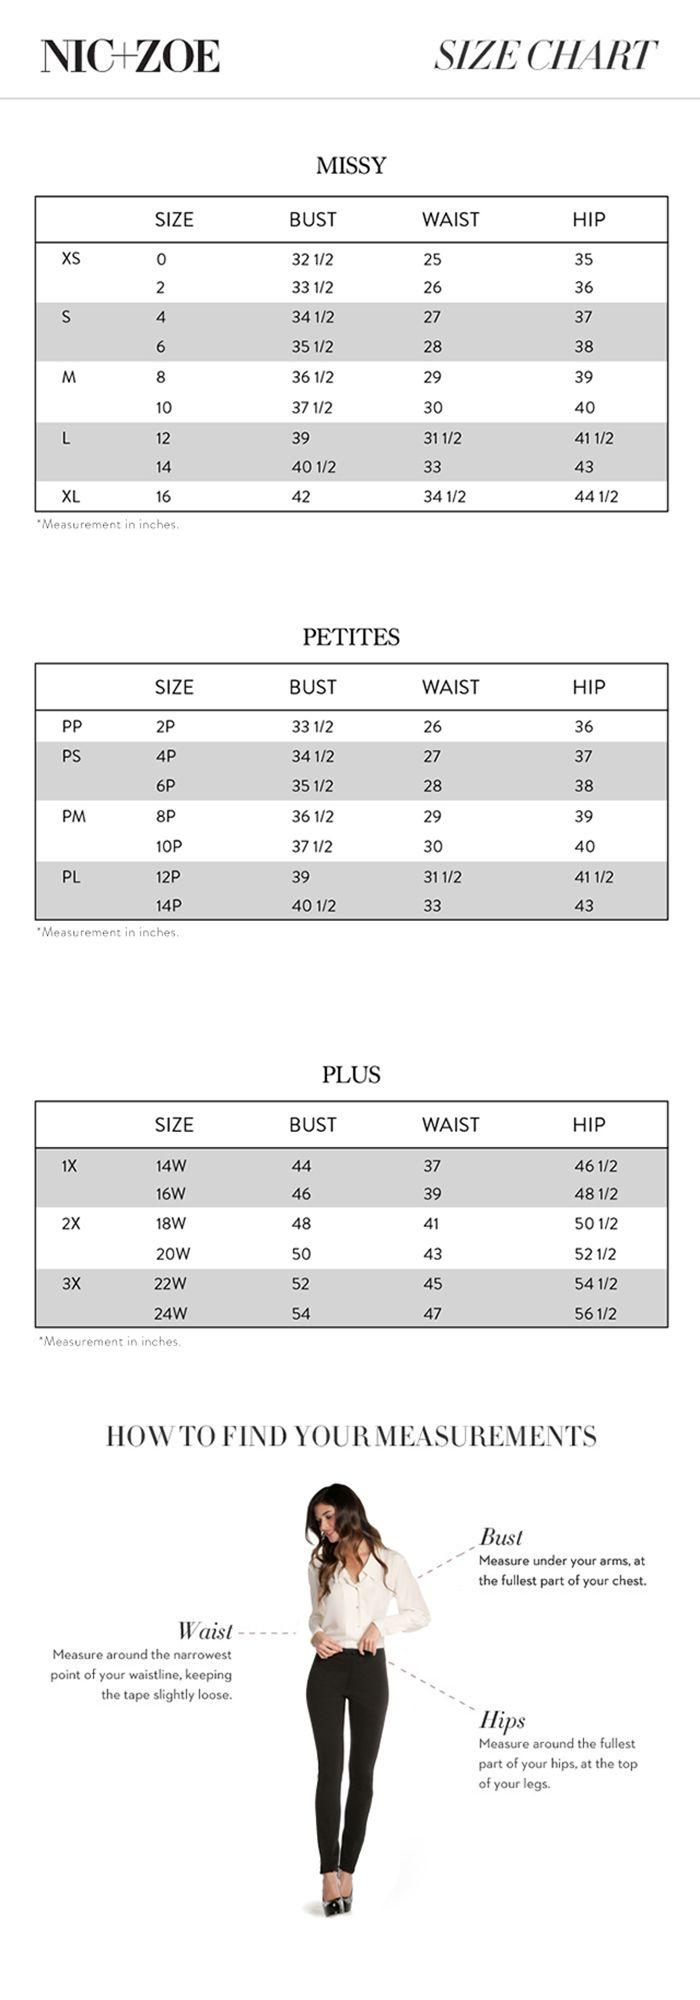 Nic Zoe Regular Petite And Plus Size Chart Via Nicandzoe